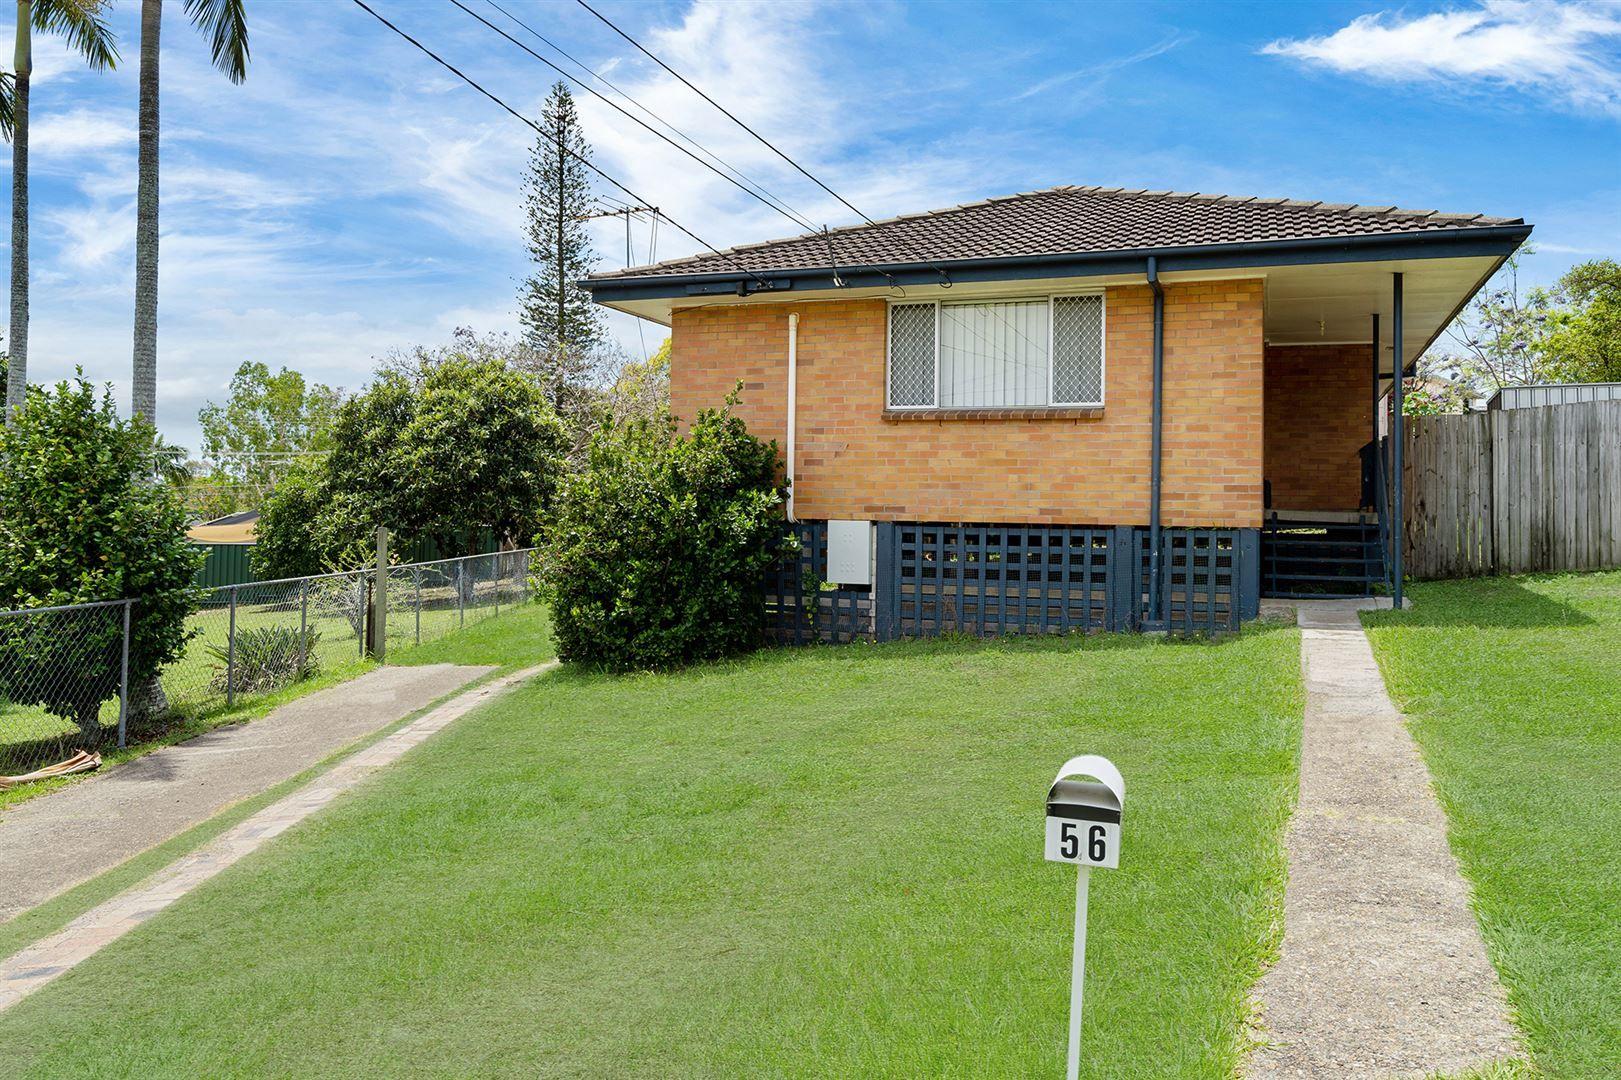 56 Wagawn Street, Woodridge QLD 4114, Image 1